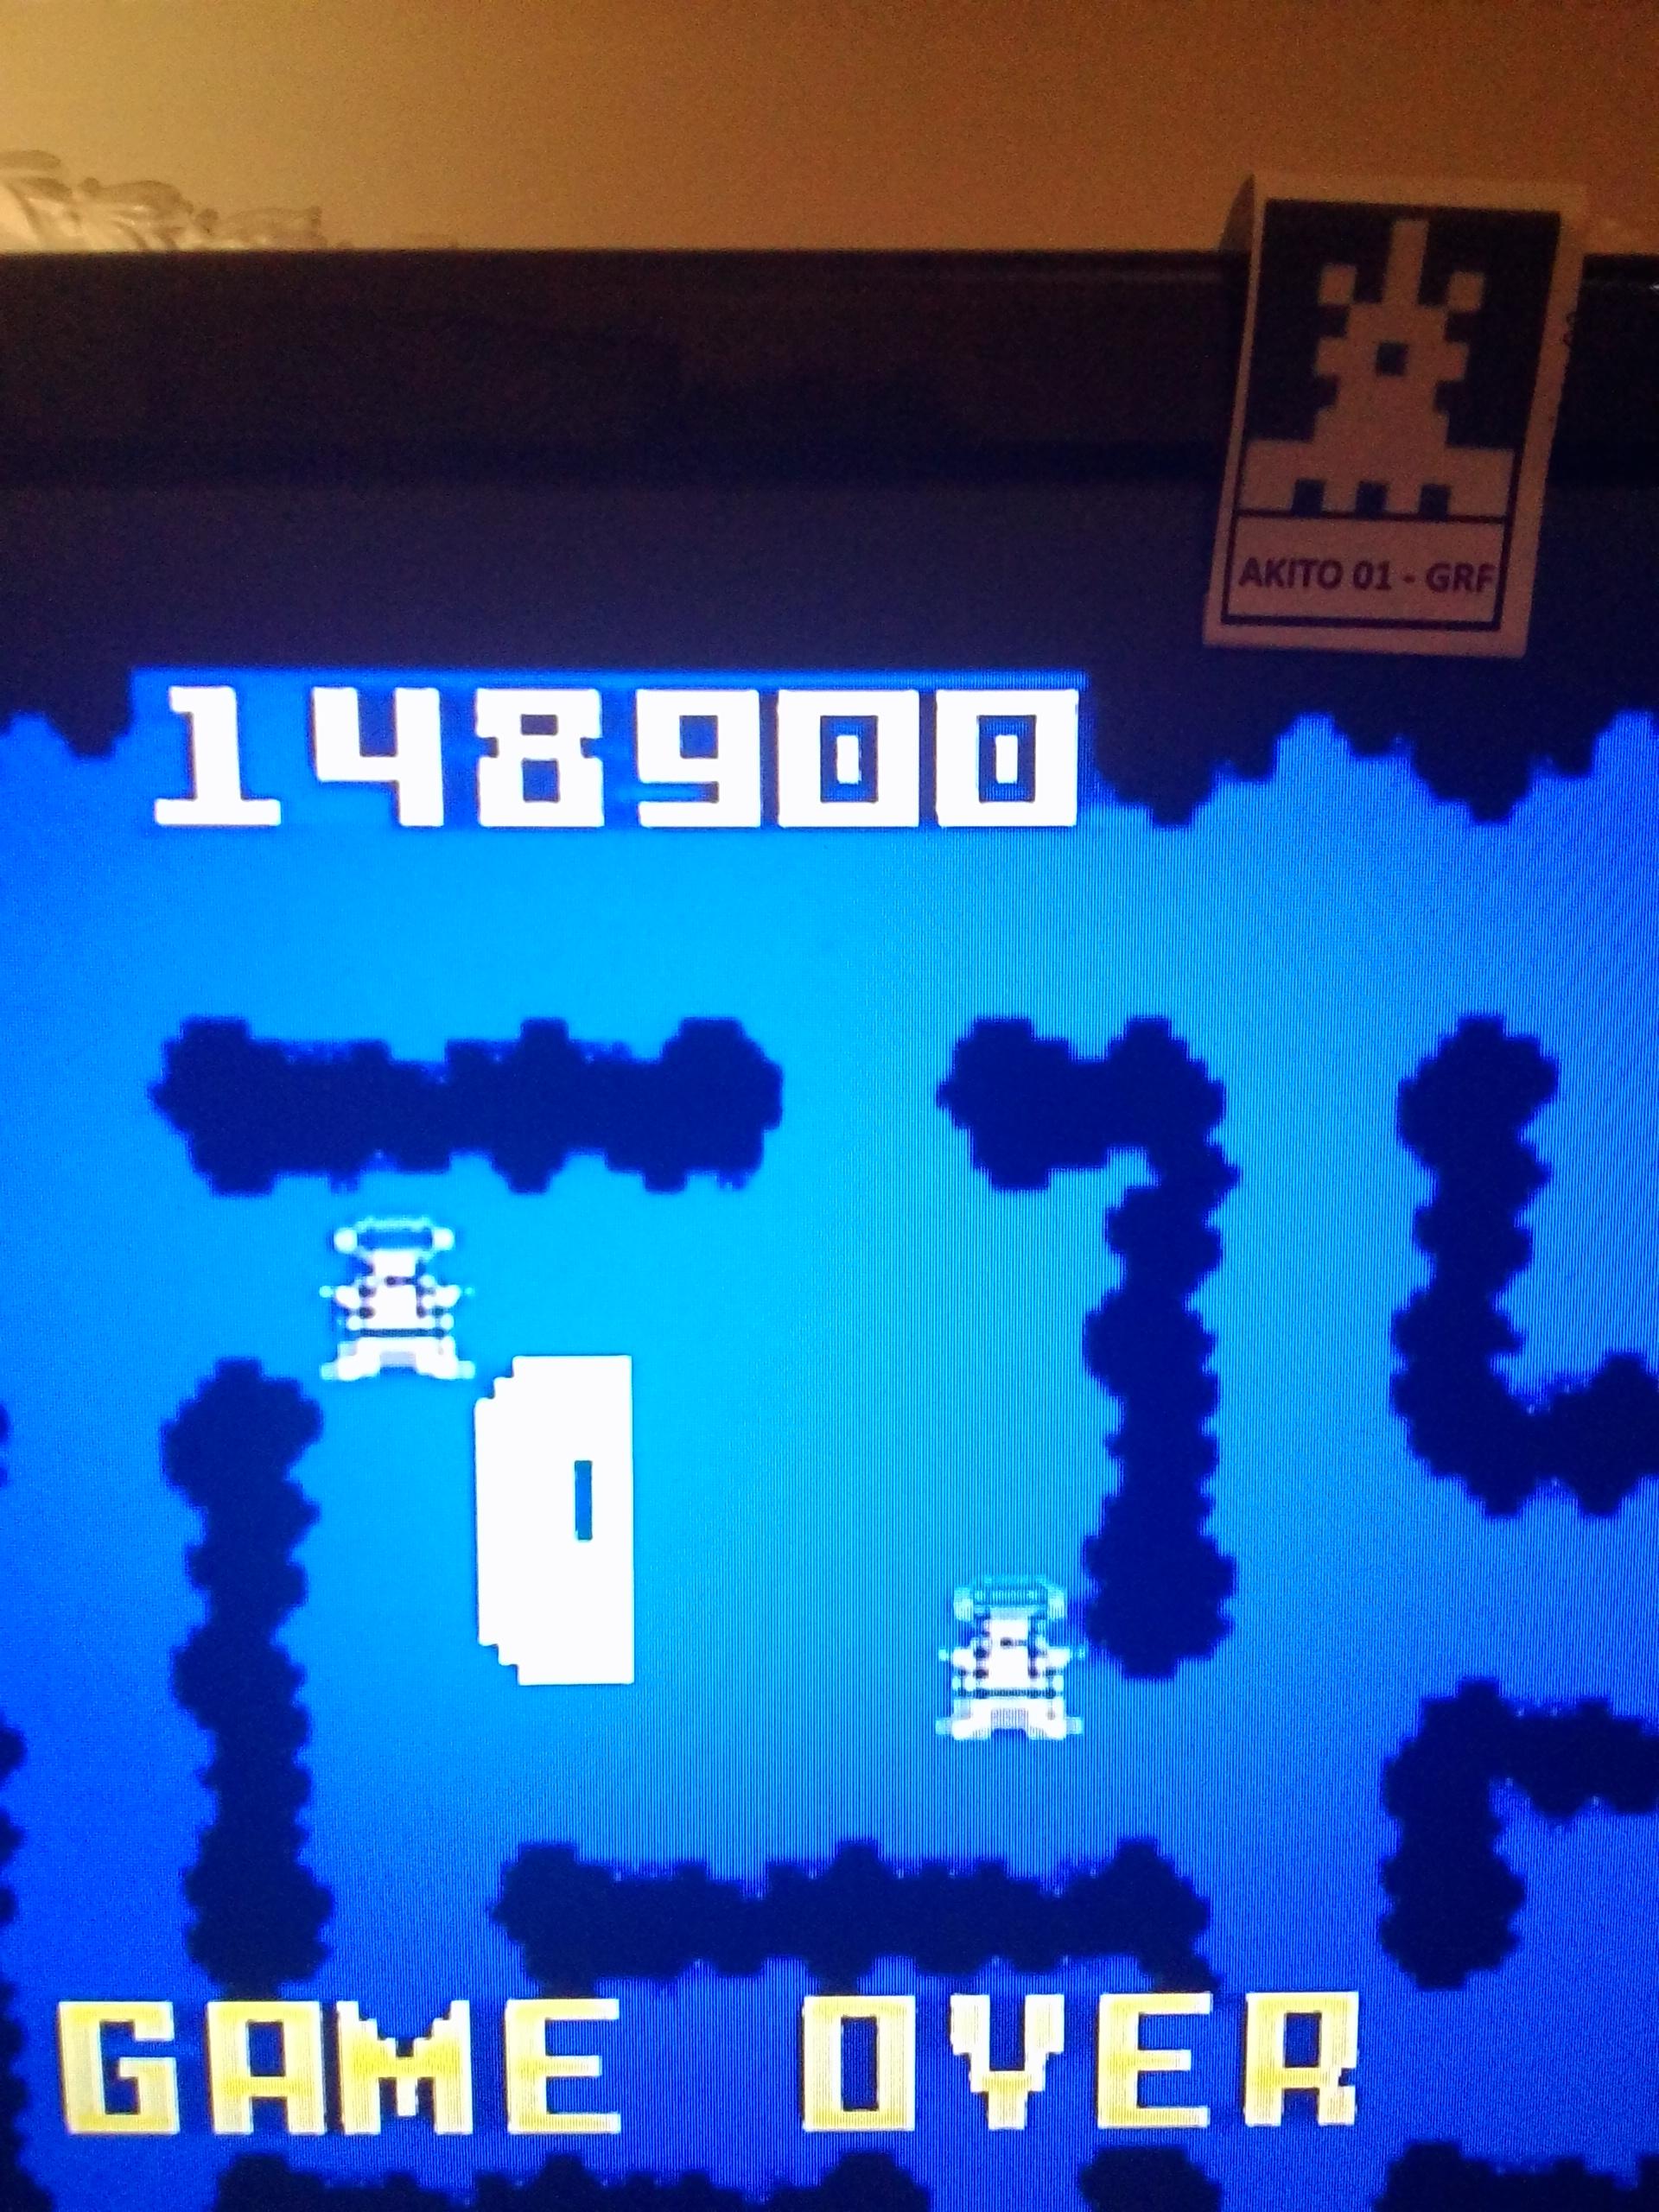 Nightstalker 148,900 points